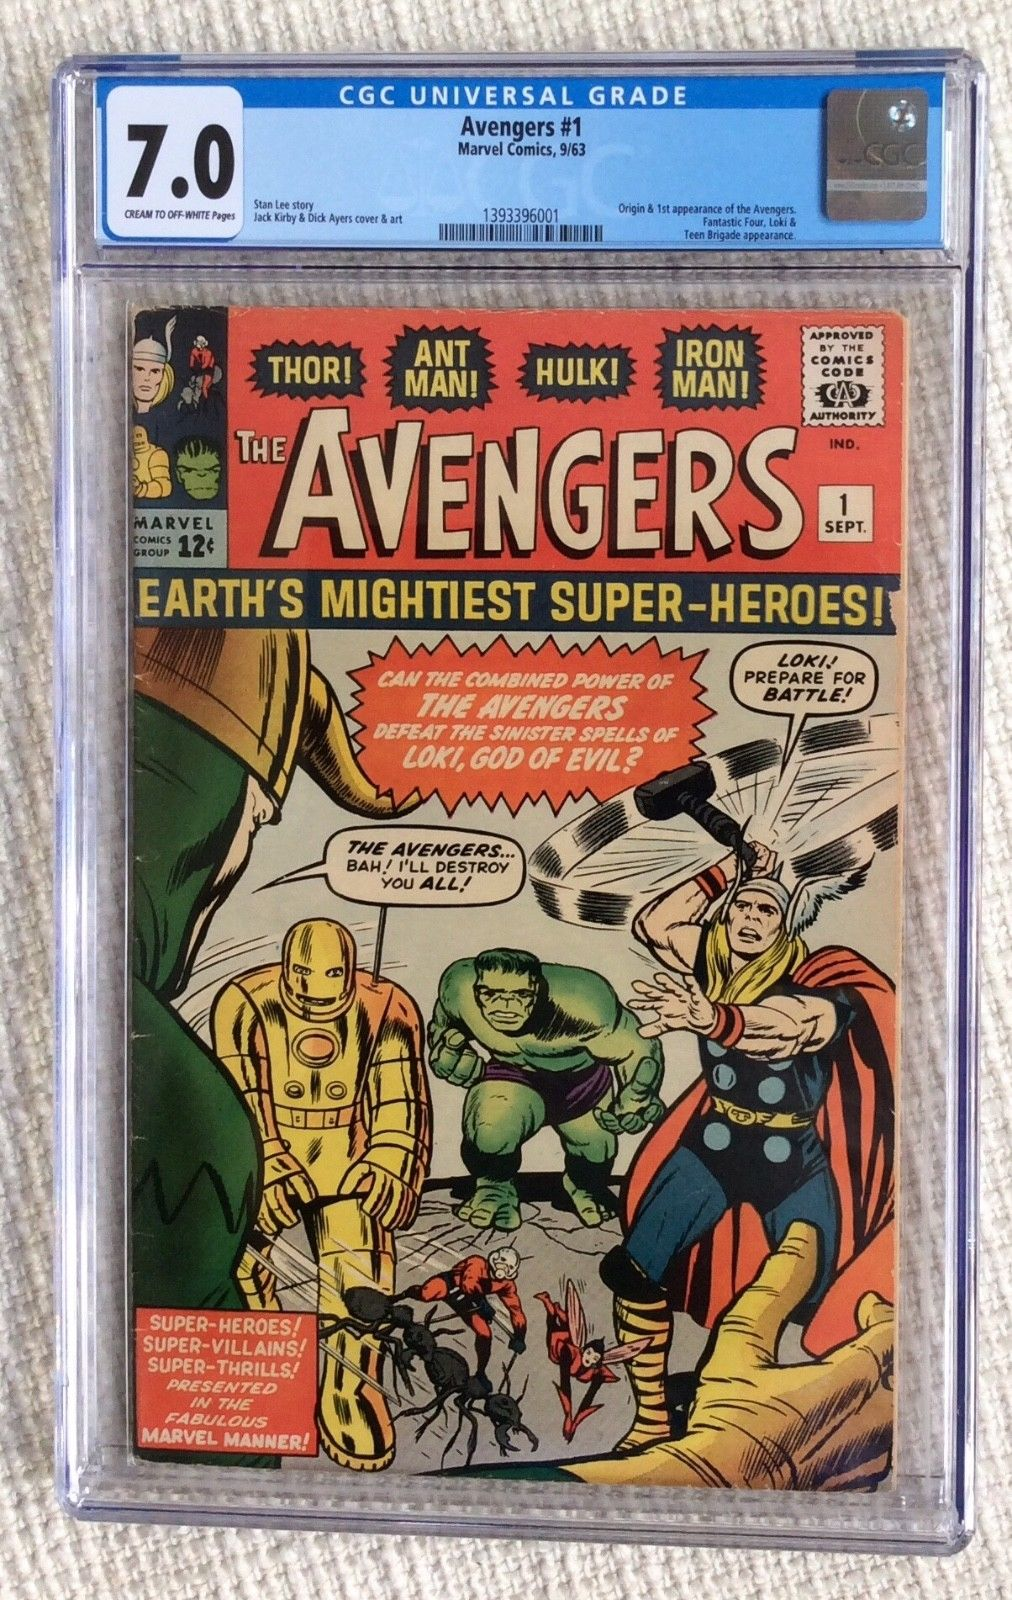 Avengers 1 CGC 7.0 Stan Lee 1963 Origin & 1st App. Fantastic Four 4 App Thor